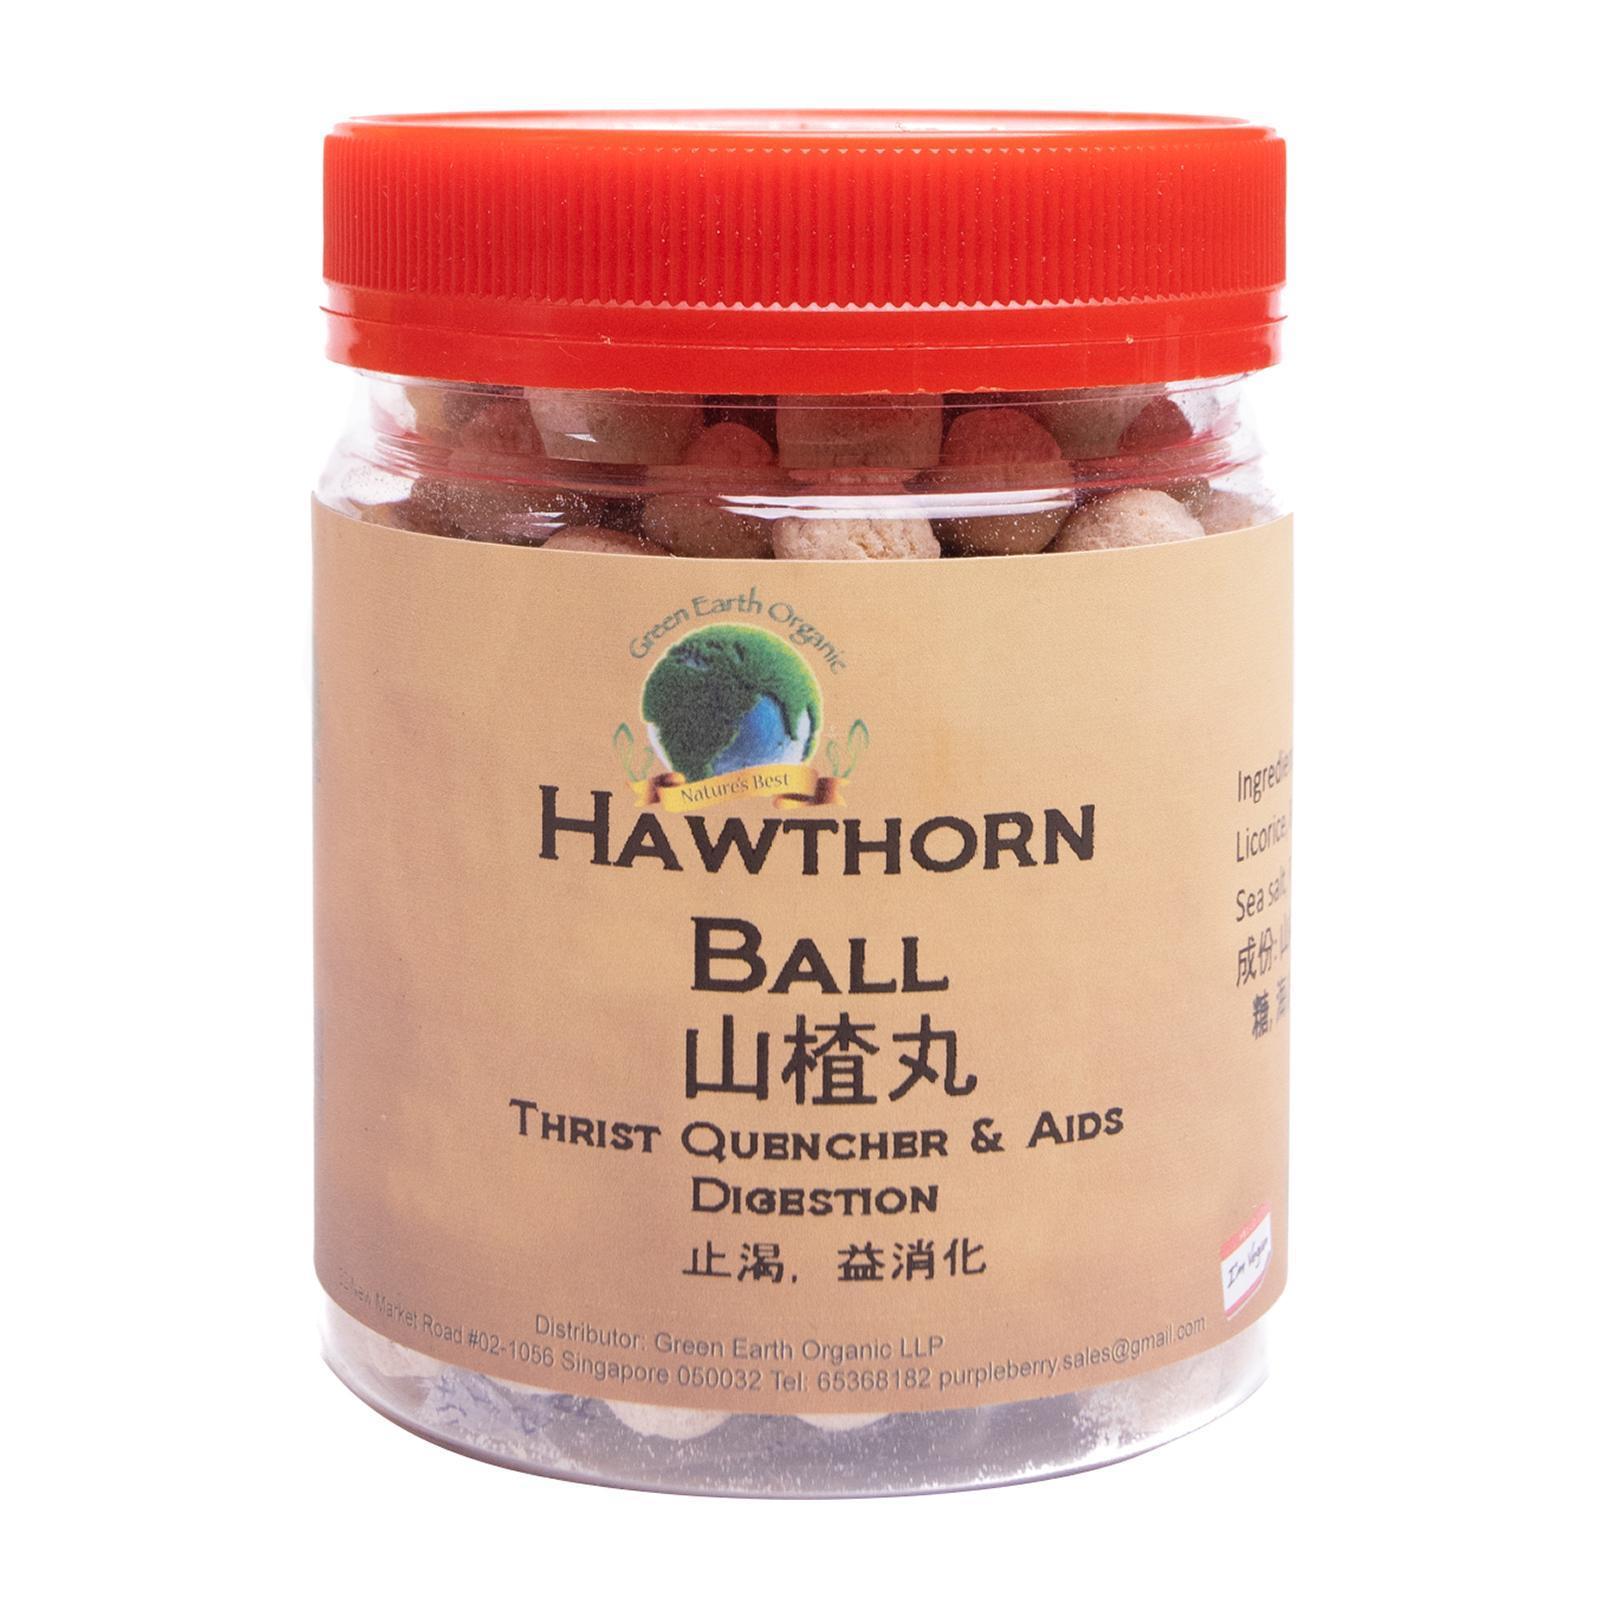 Green Earth Hawthorne Ball